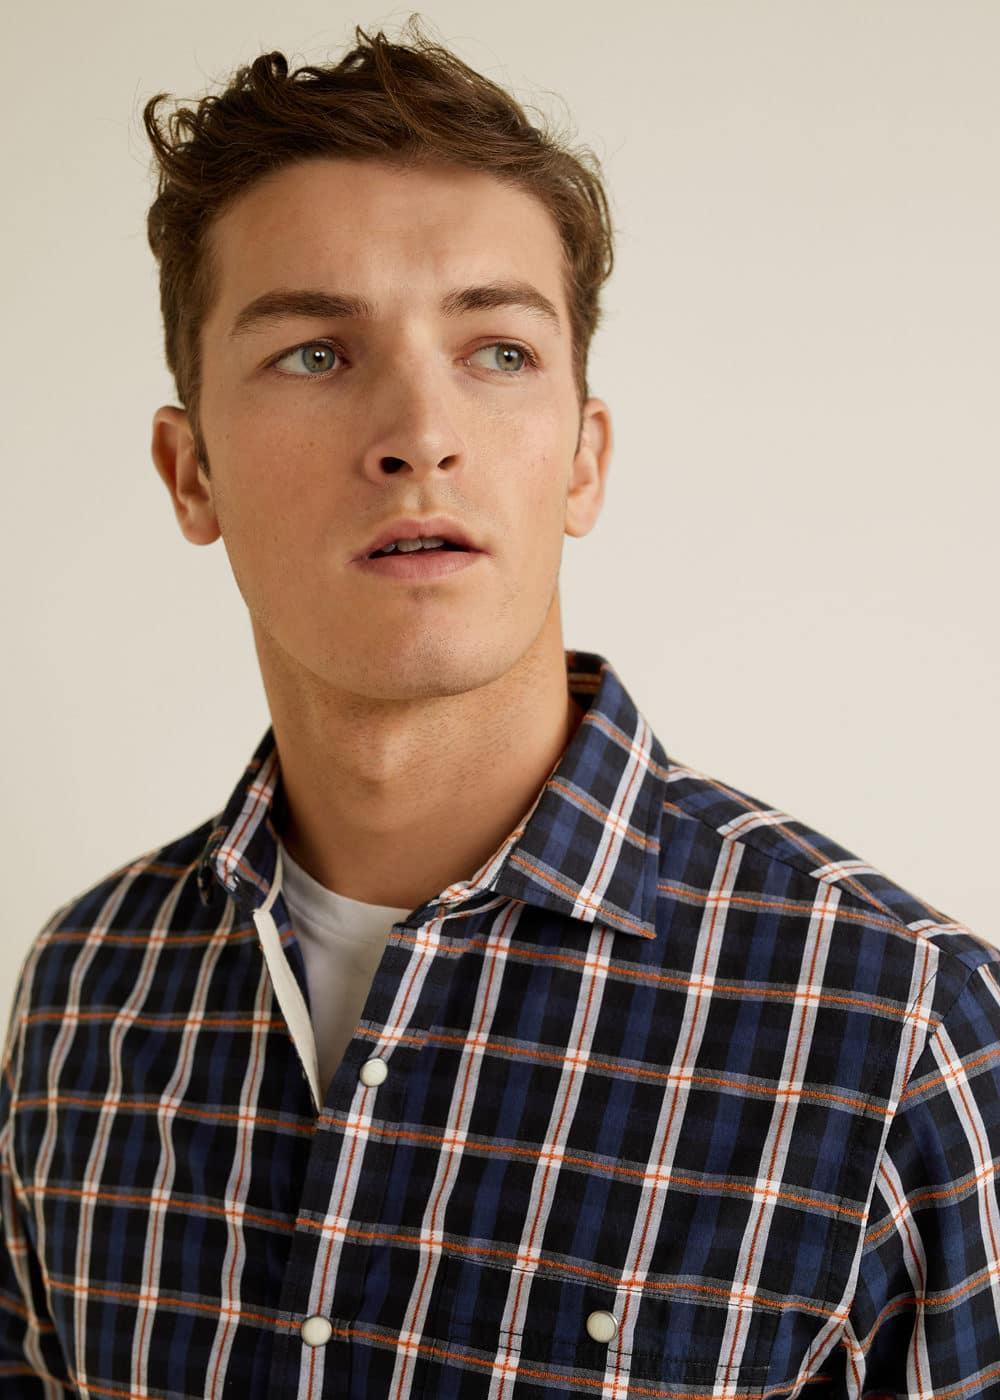 Mango - Camisa slim-fit algodón cuadros - 4